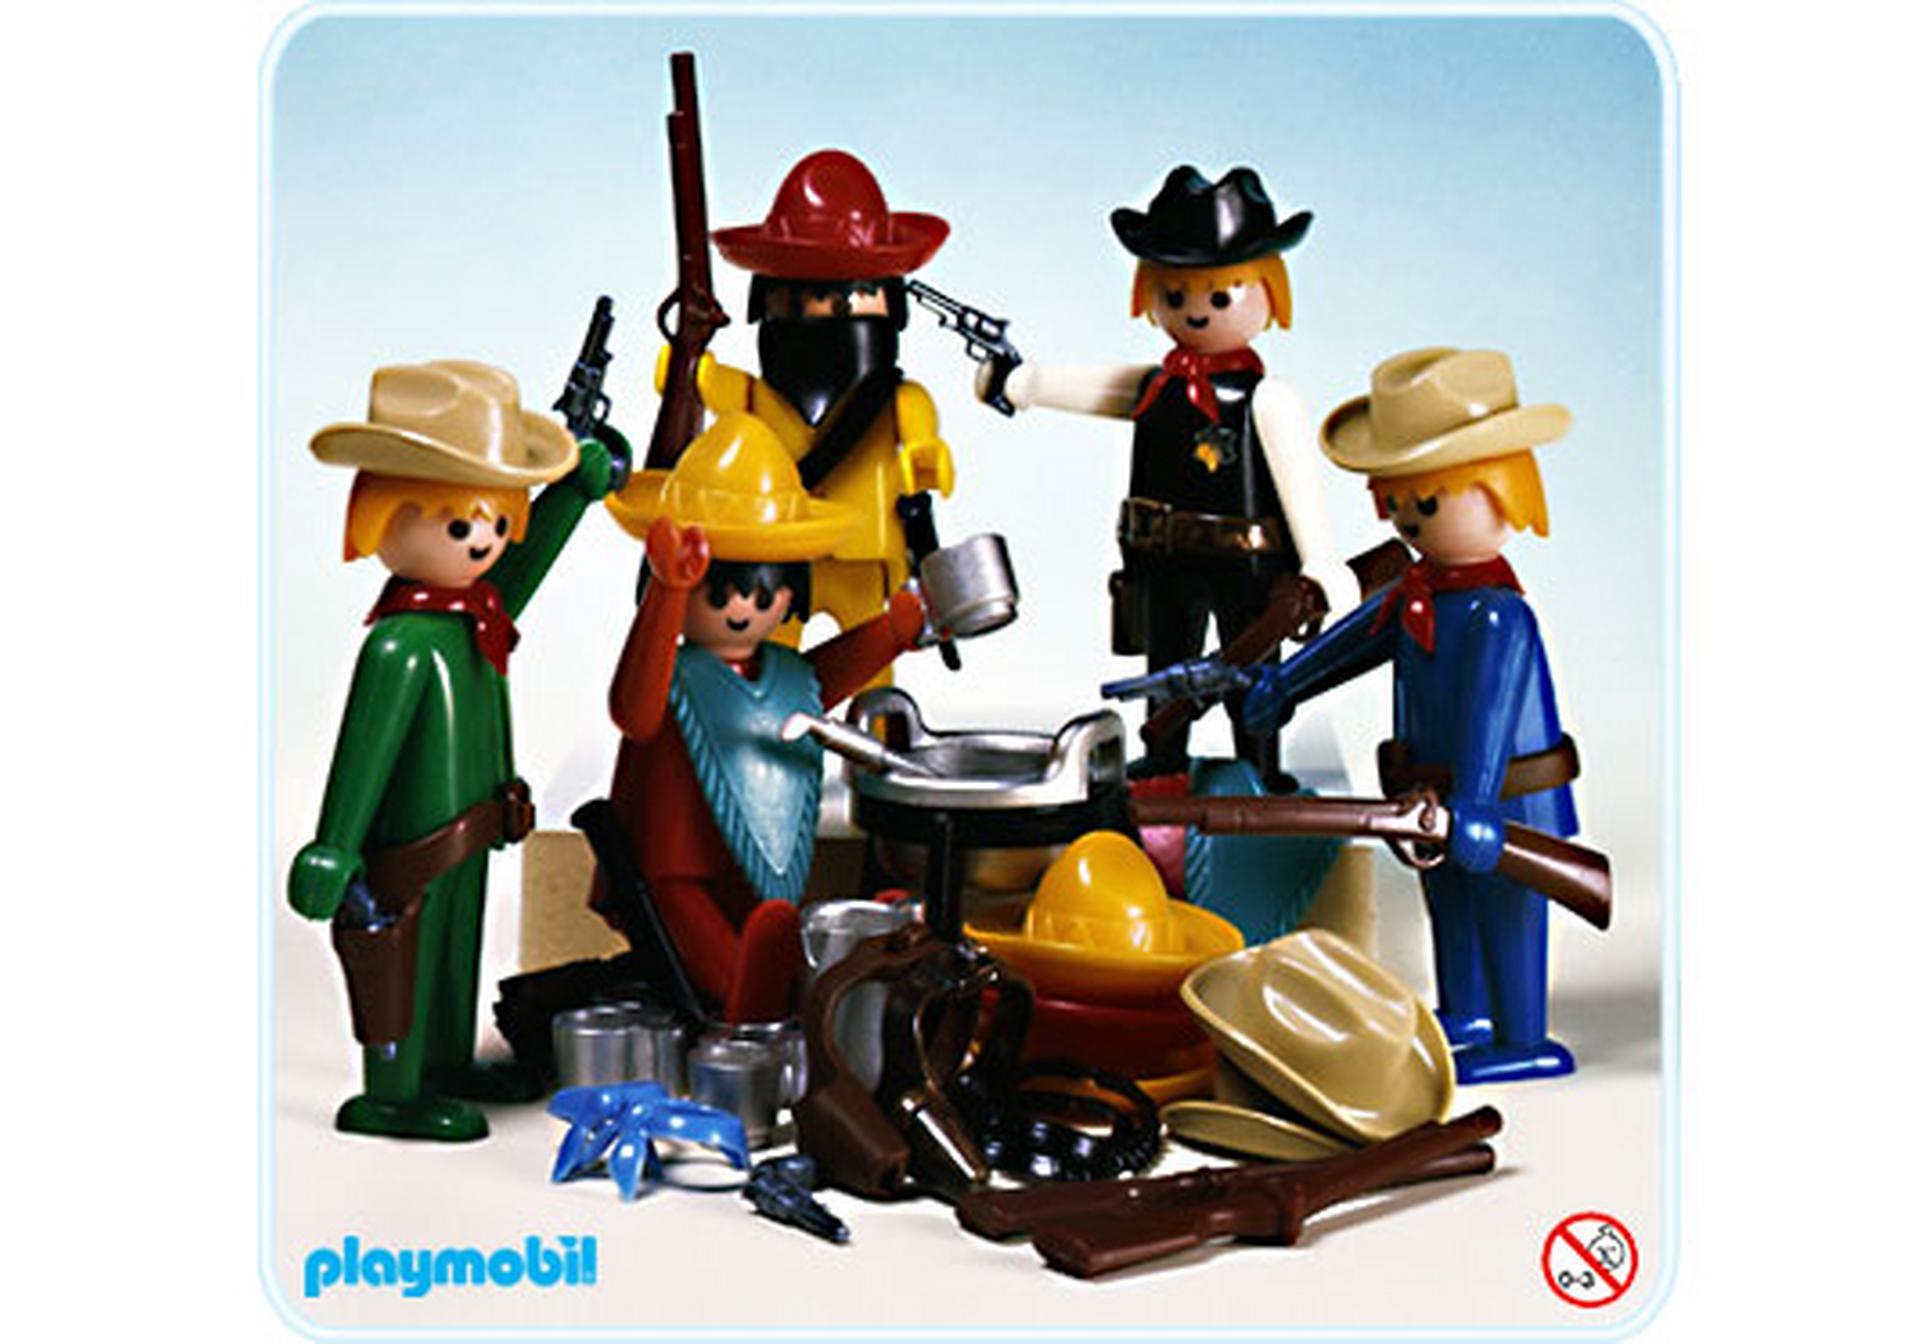 Cowboy mexikaner set 3241 a playmobil deutschland for Jugendzimmer playmobil